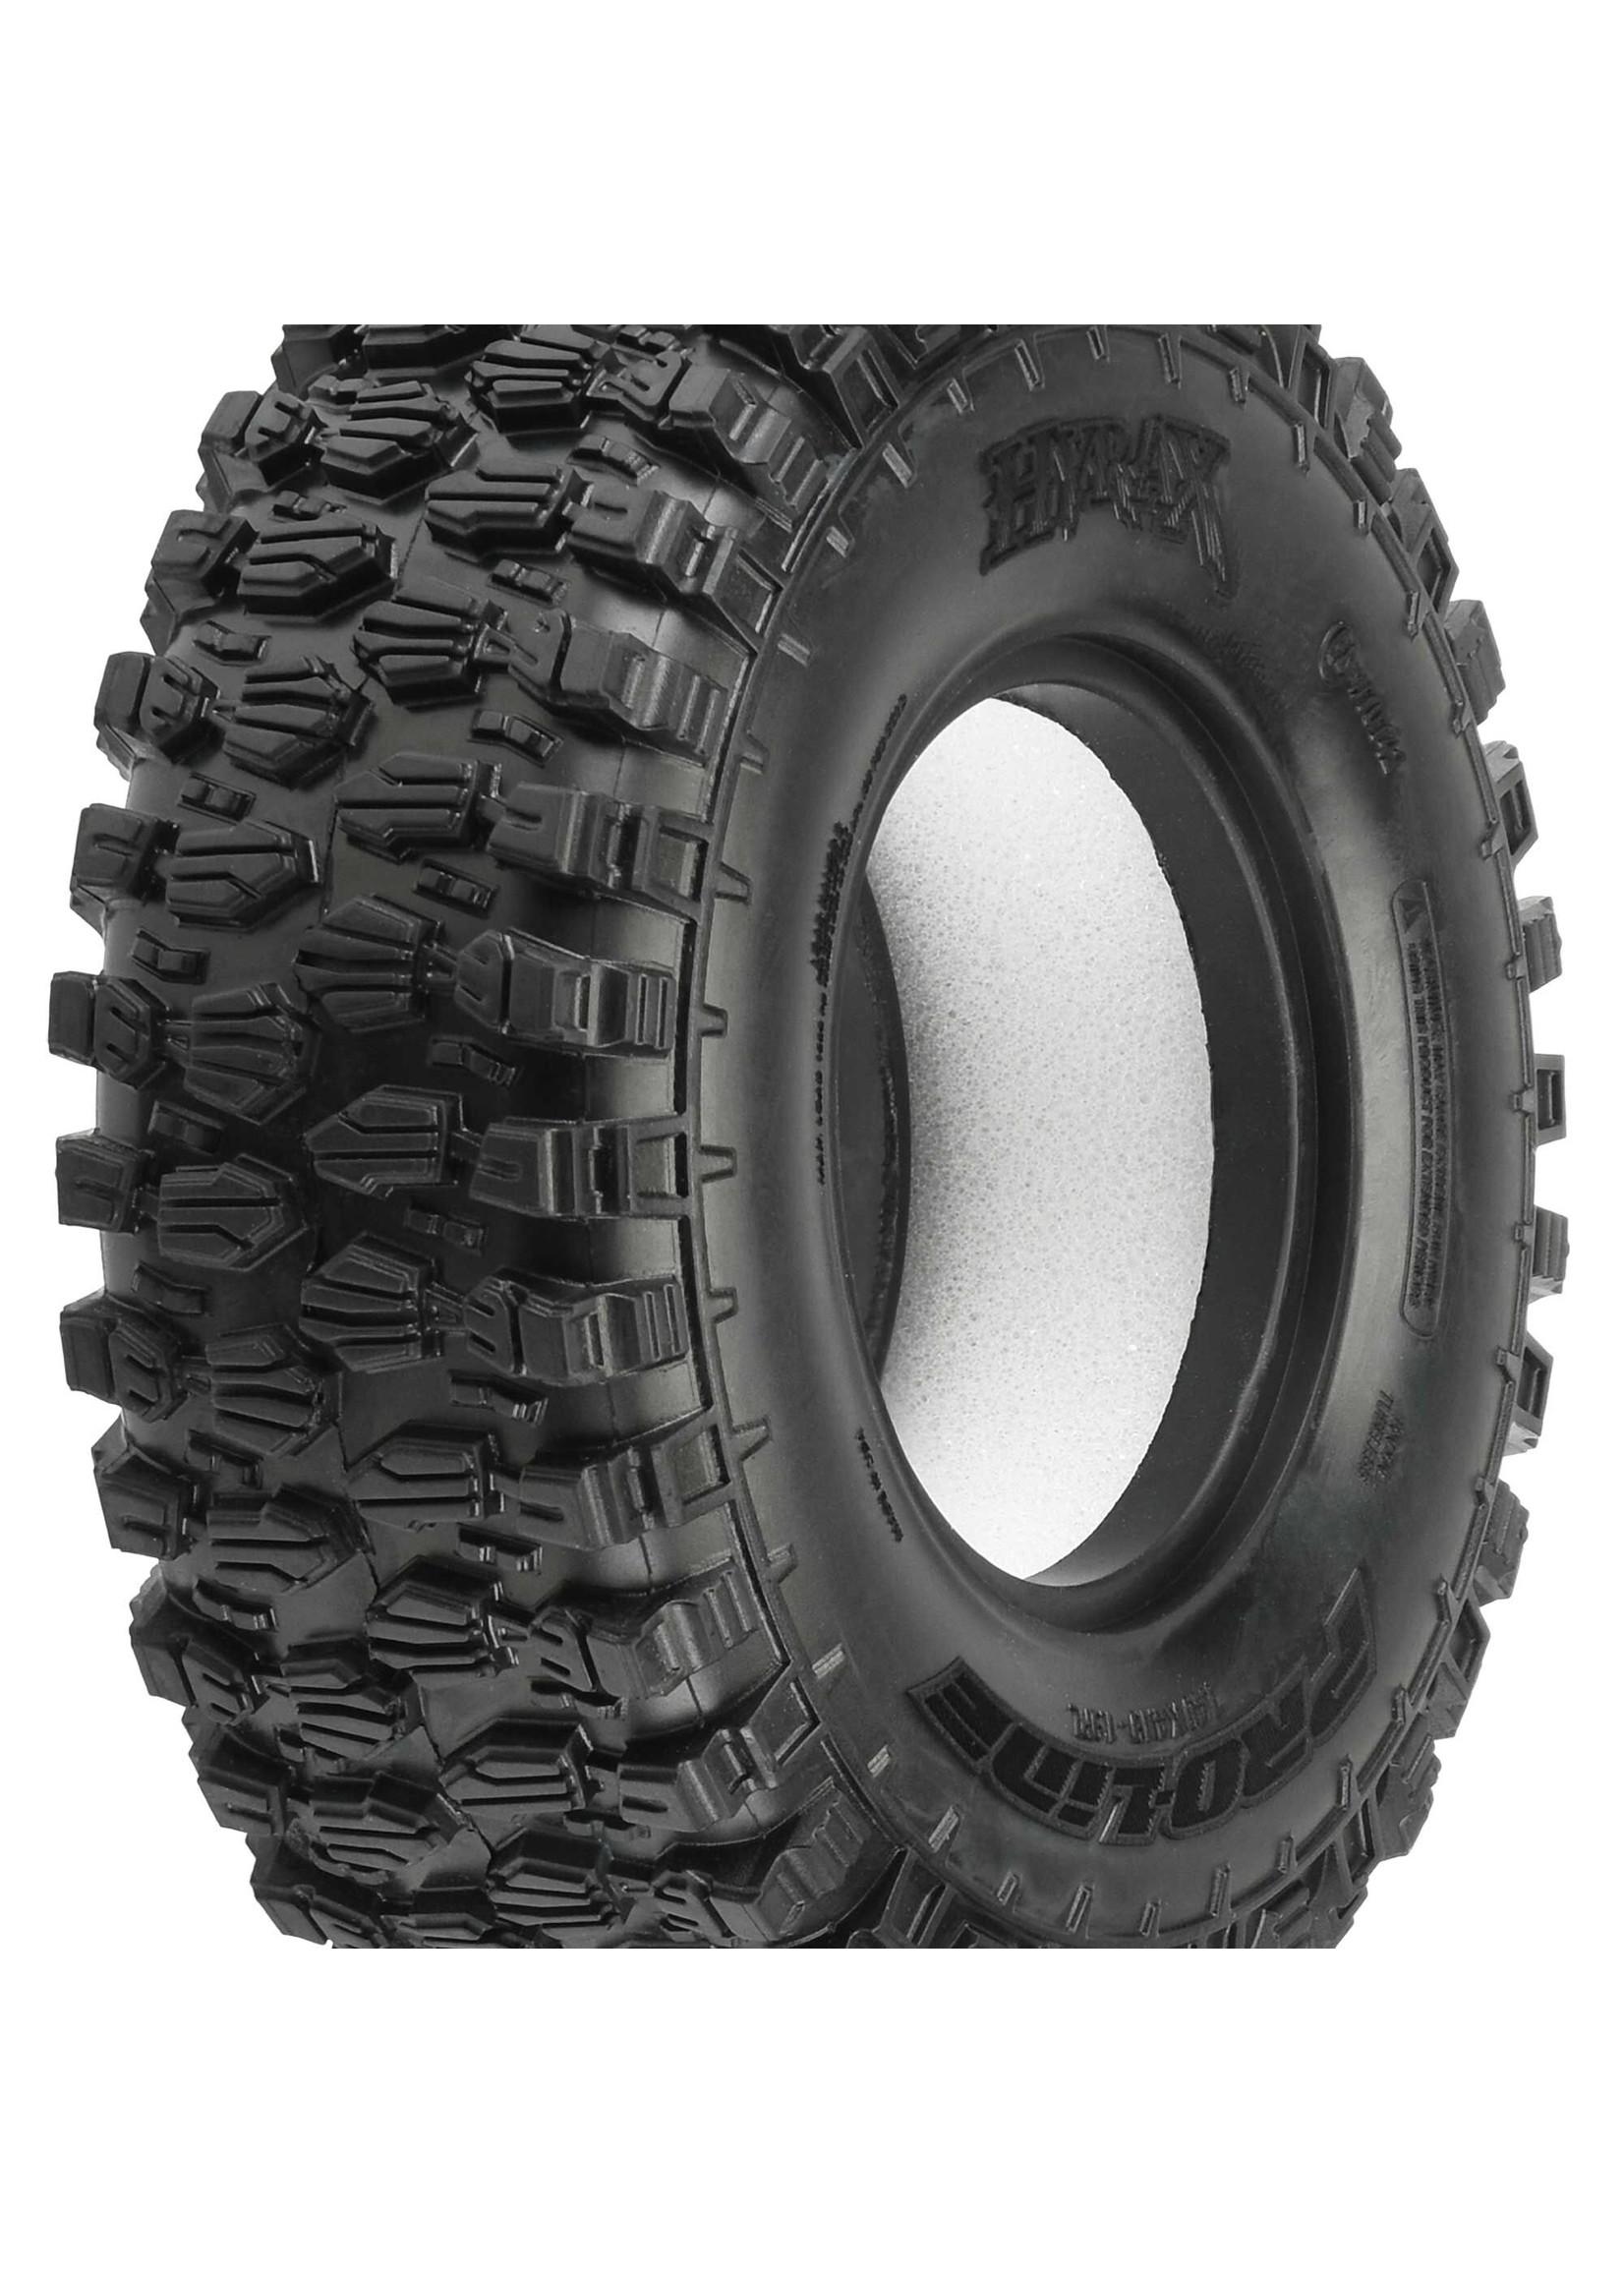 Pro-Line Racing PRO1014214 Pro-Line Class 1 Hyrax 1.9, 4.19 OD, G8  Crawler Tire (2)